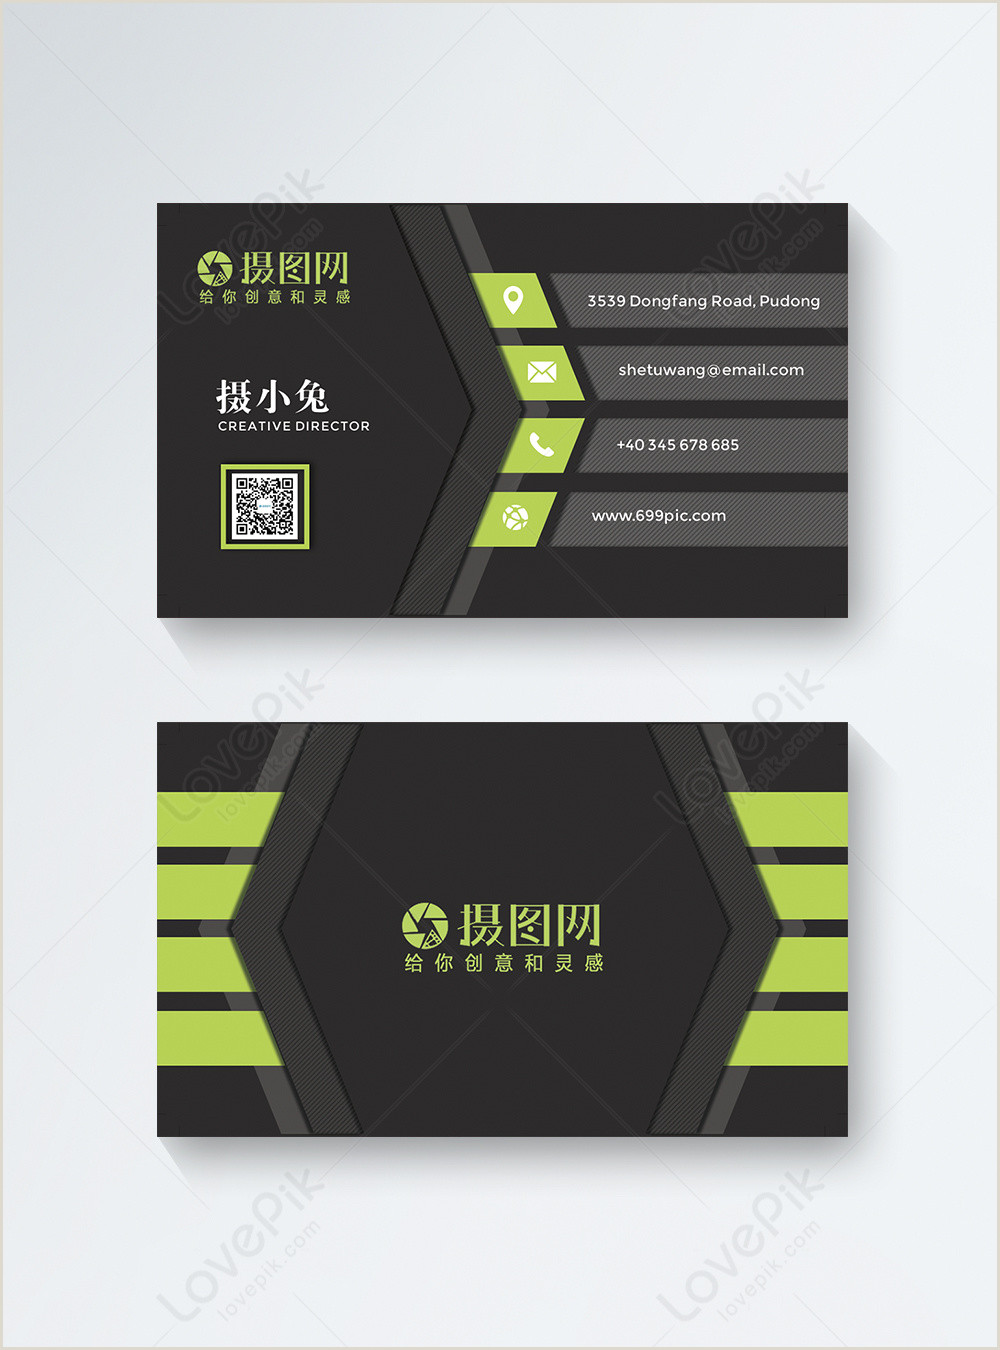 Best Business Cards Geometric Modern Business Card With Geometric Art Design Template